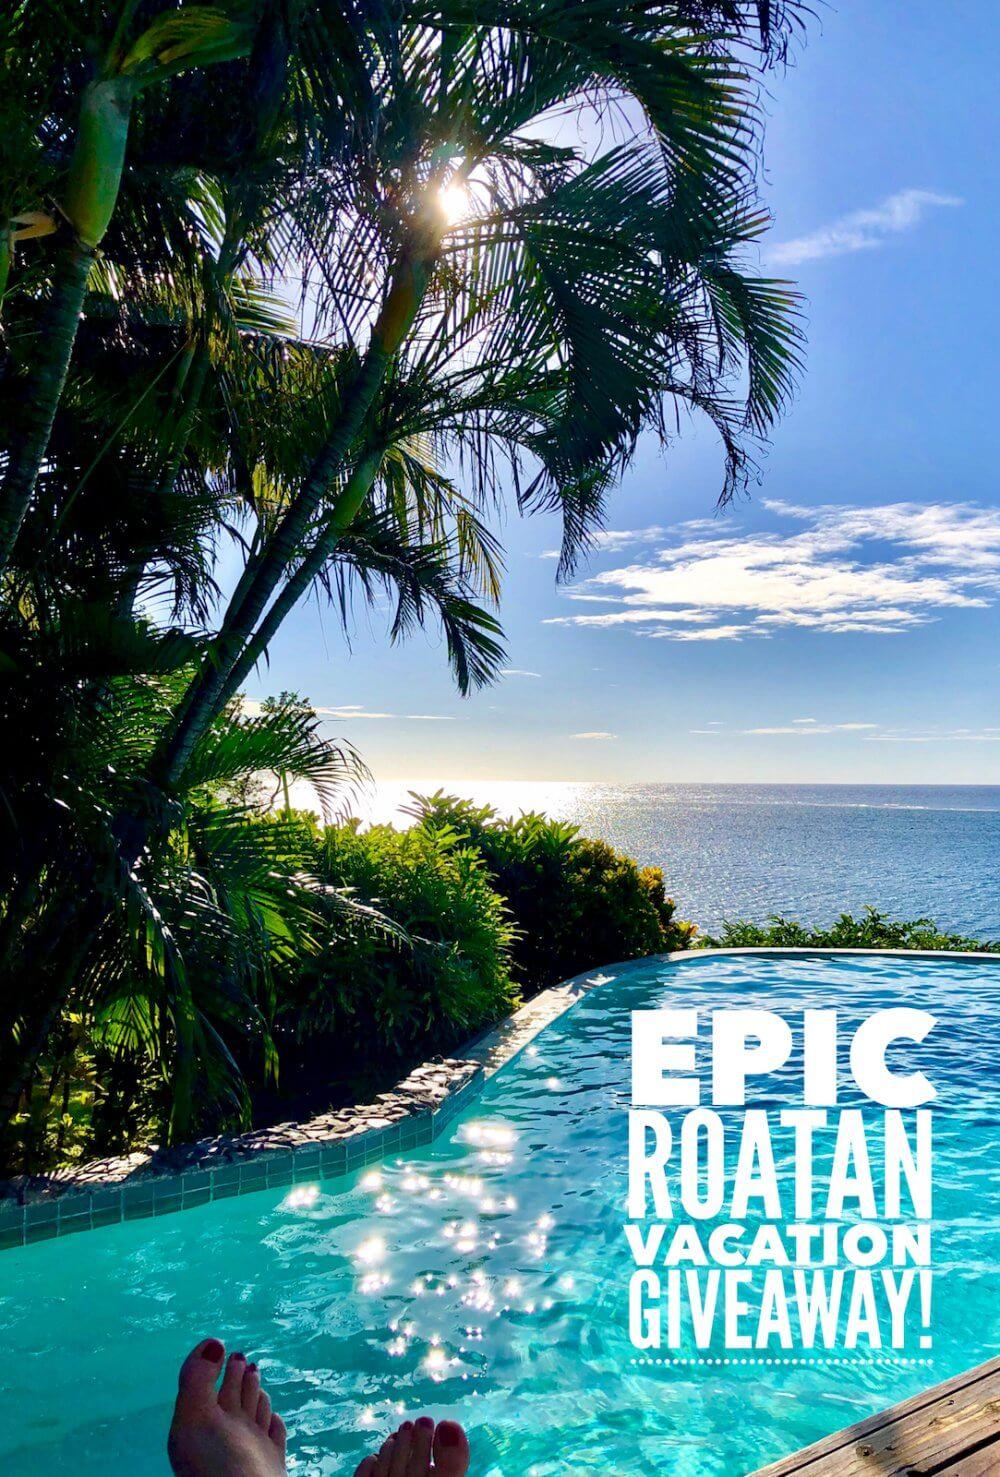 Epic Roatan Vacation Giveaway